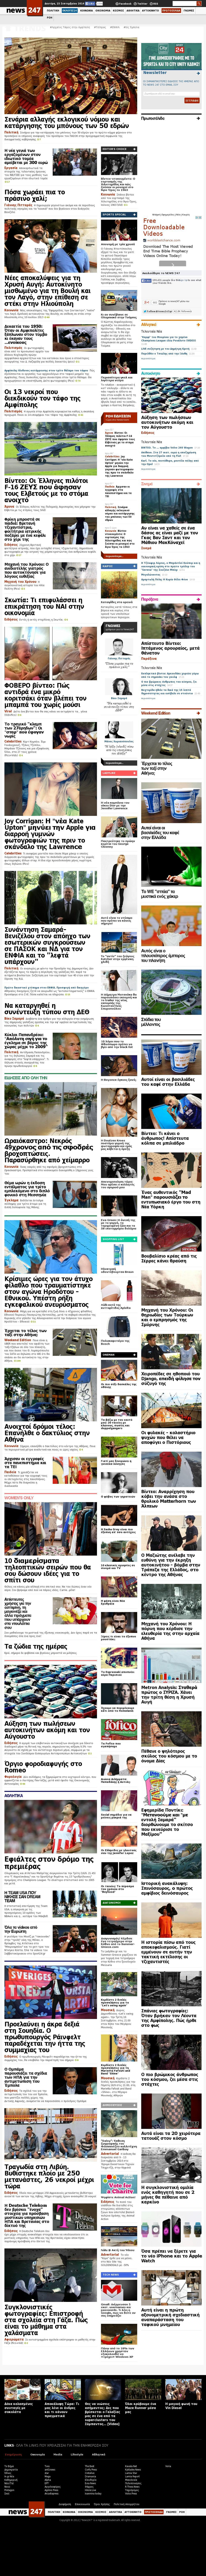 News 247 at Monday Sept. 15, 2014, 9:12 a.m. UTC